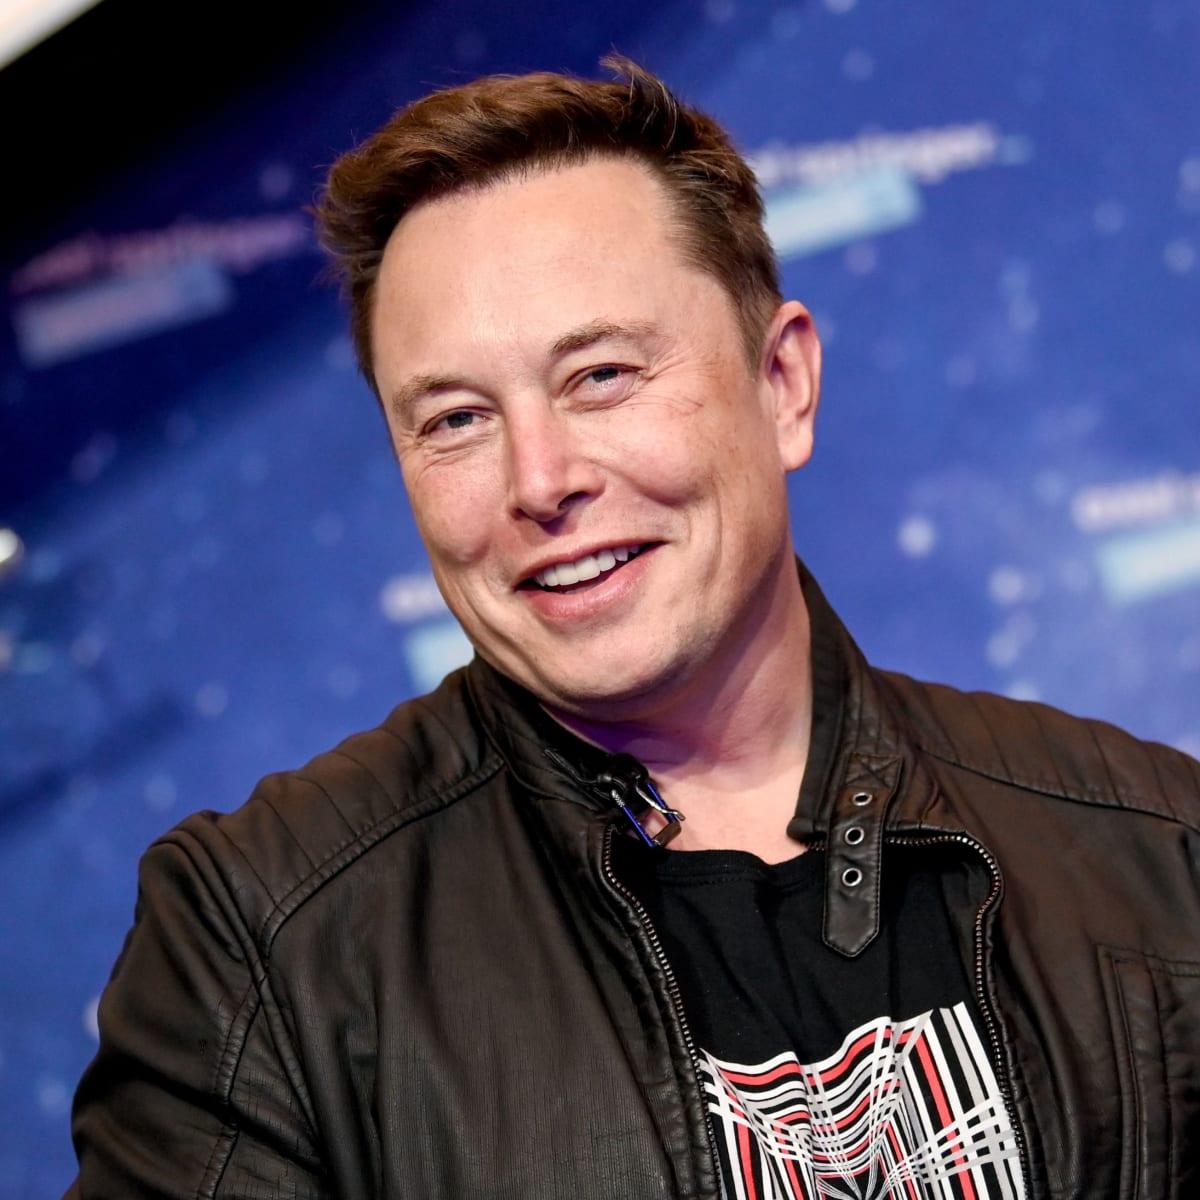 एलन मस्क की बायोग्राफी,Elon Musk Biography in Hindi,Elon Musk ki jivani,Elon Musk success story, Elon Musk kaun hai,Elon Musk income in hindi